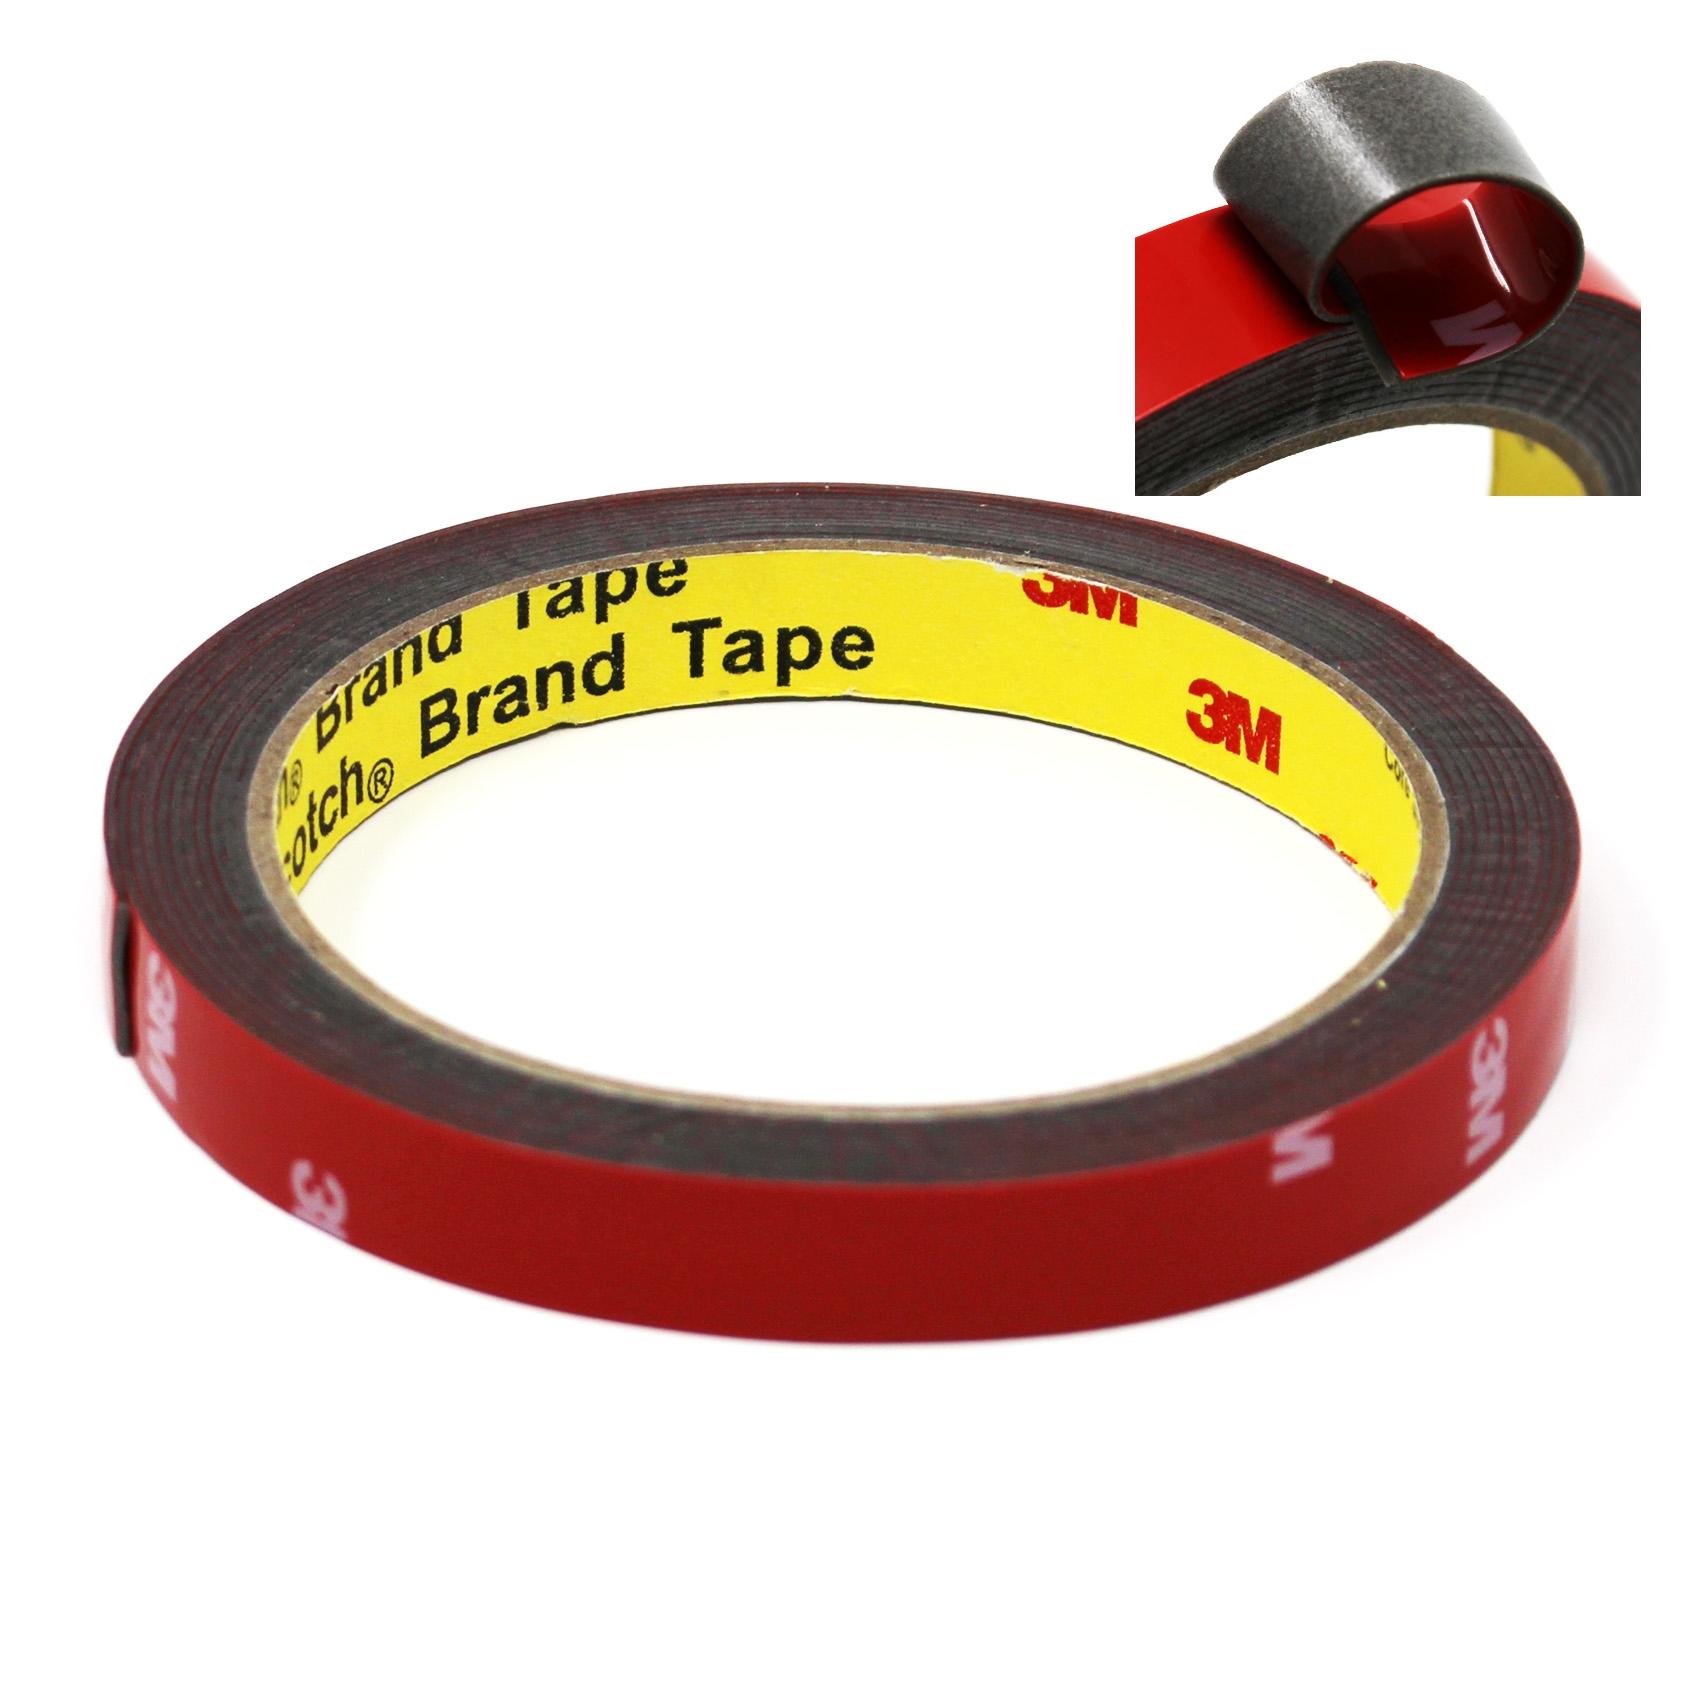 Doppelseitiges Klebeband Transparent Rot Extra Stark Montageklebeband 10 mm